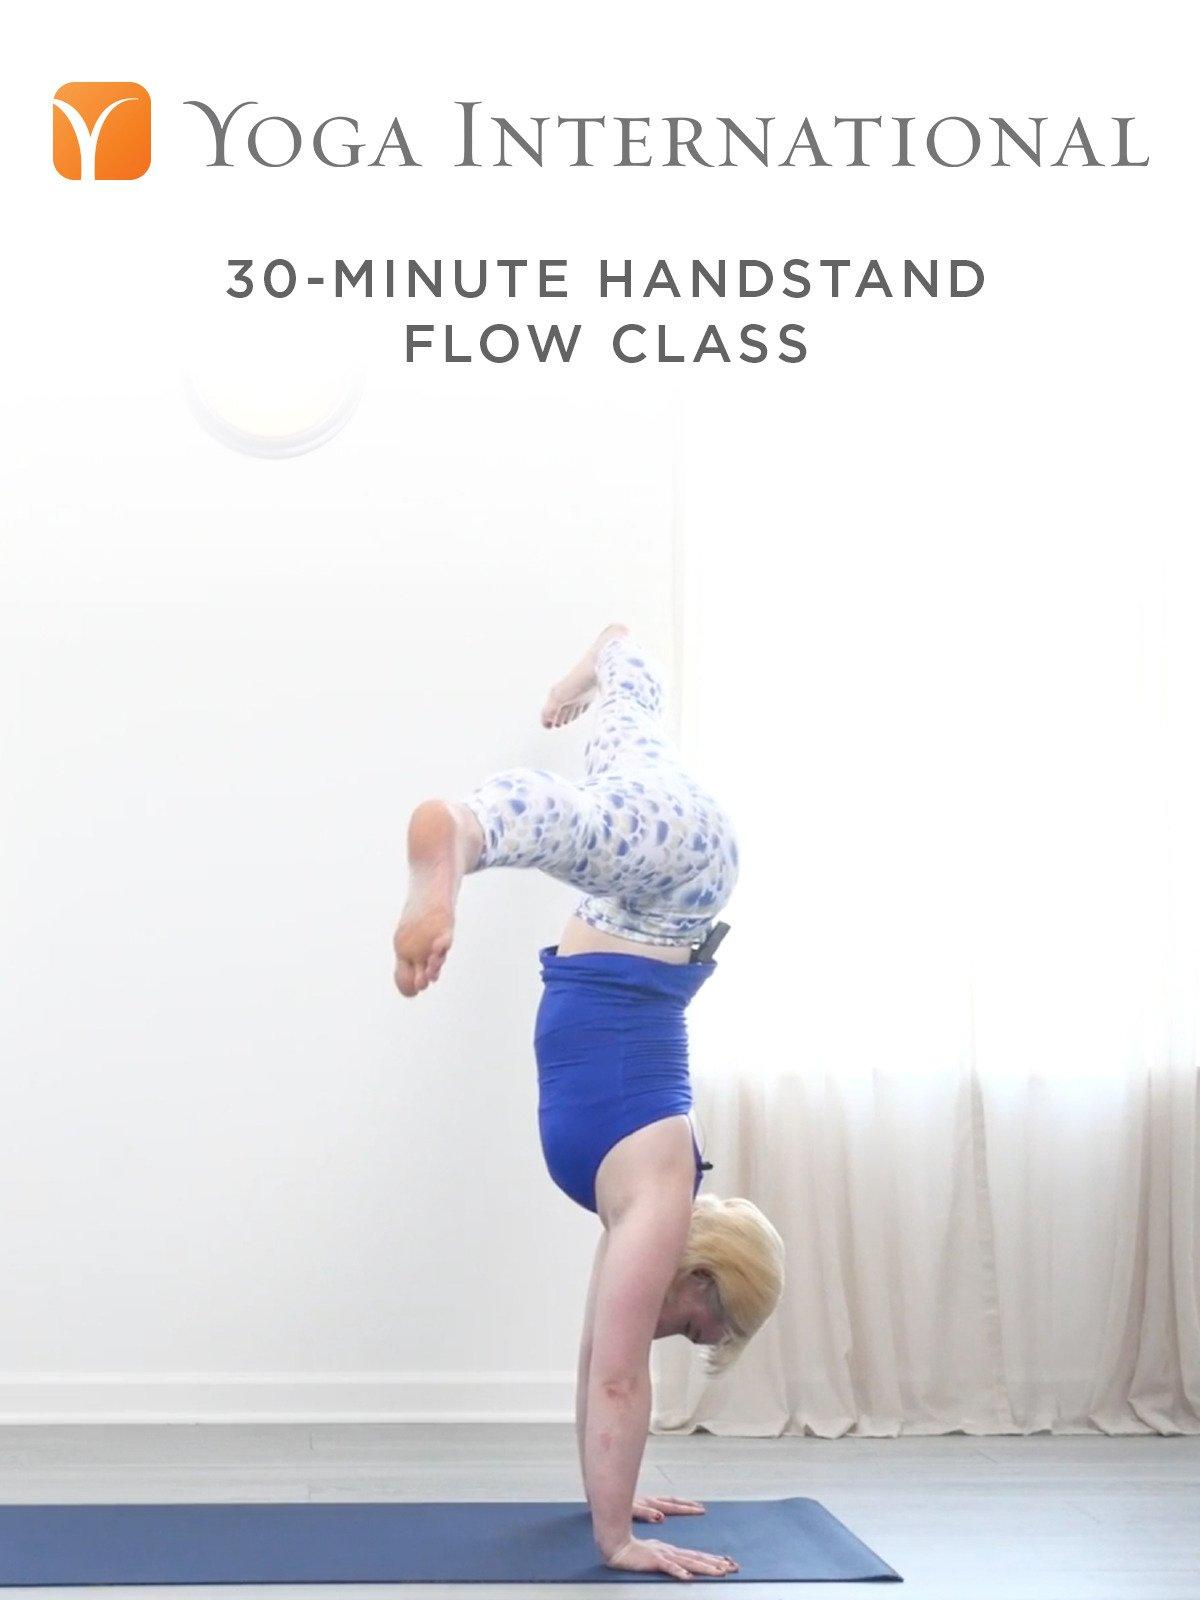 30-Minute Handstand Flow Class